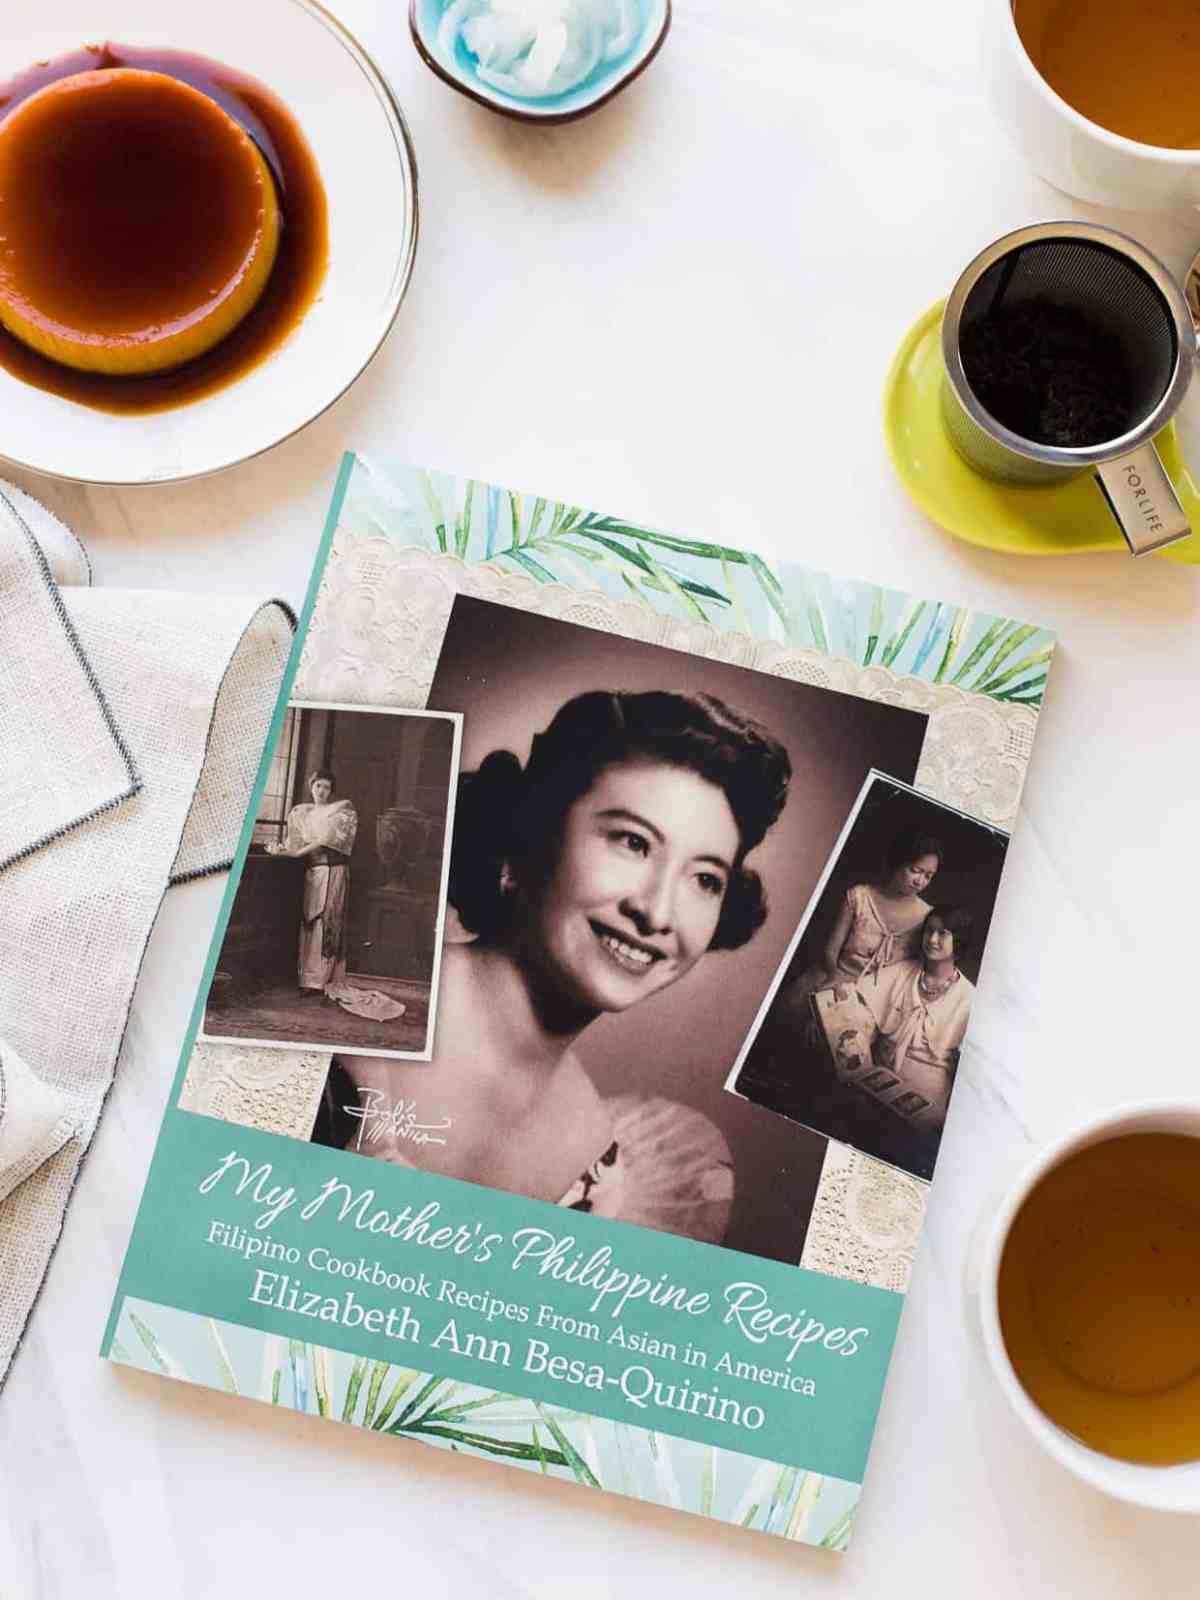 My Mother's Philippine Recipes: Filipino Cookbook Recipes from Asian in America by Elizabeth Ann Besa-Quirino